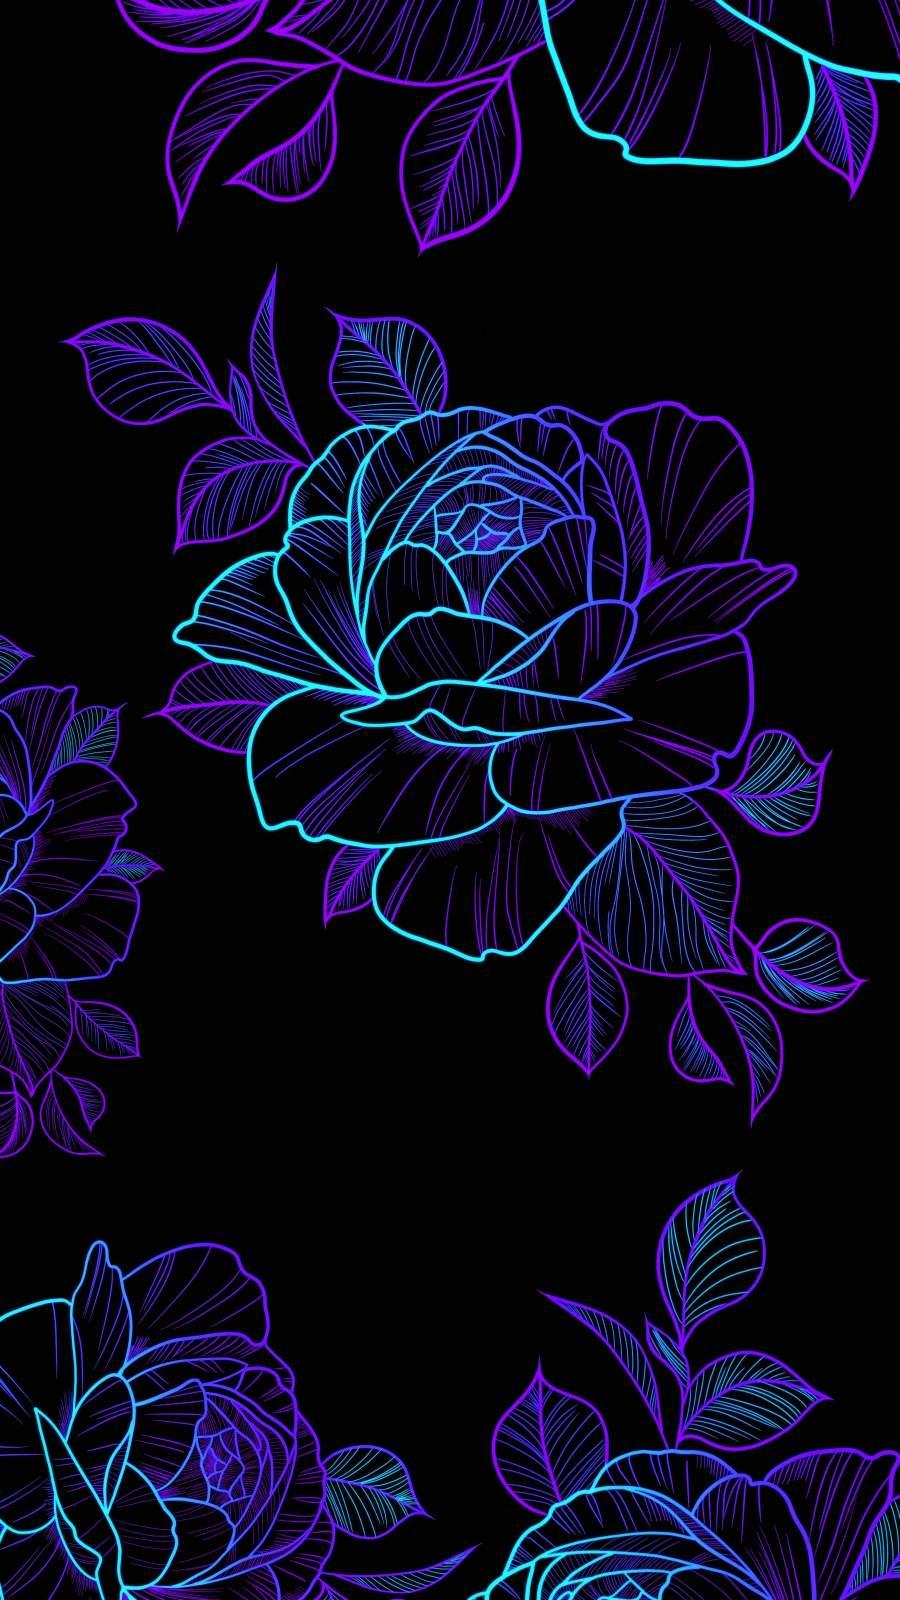 Amoled Roses iPhone Wallpaper